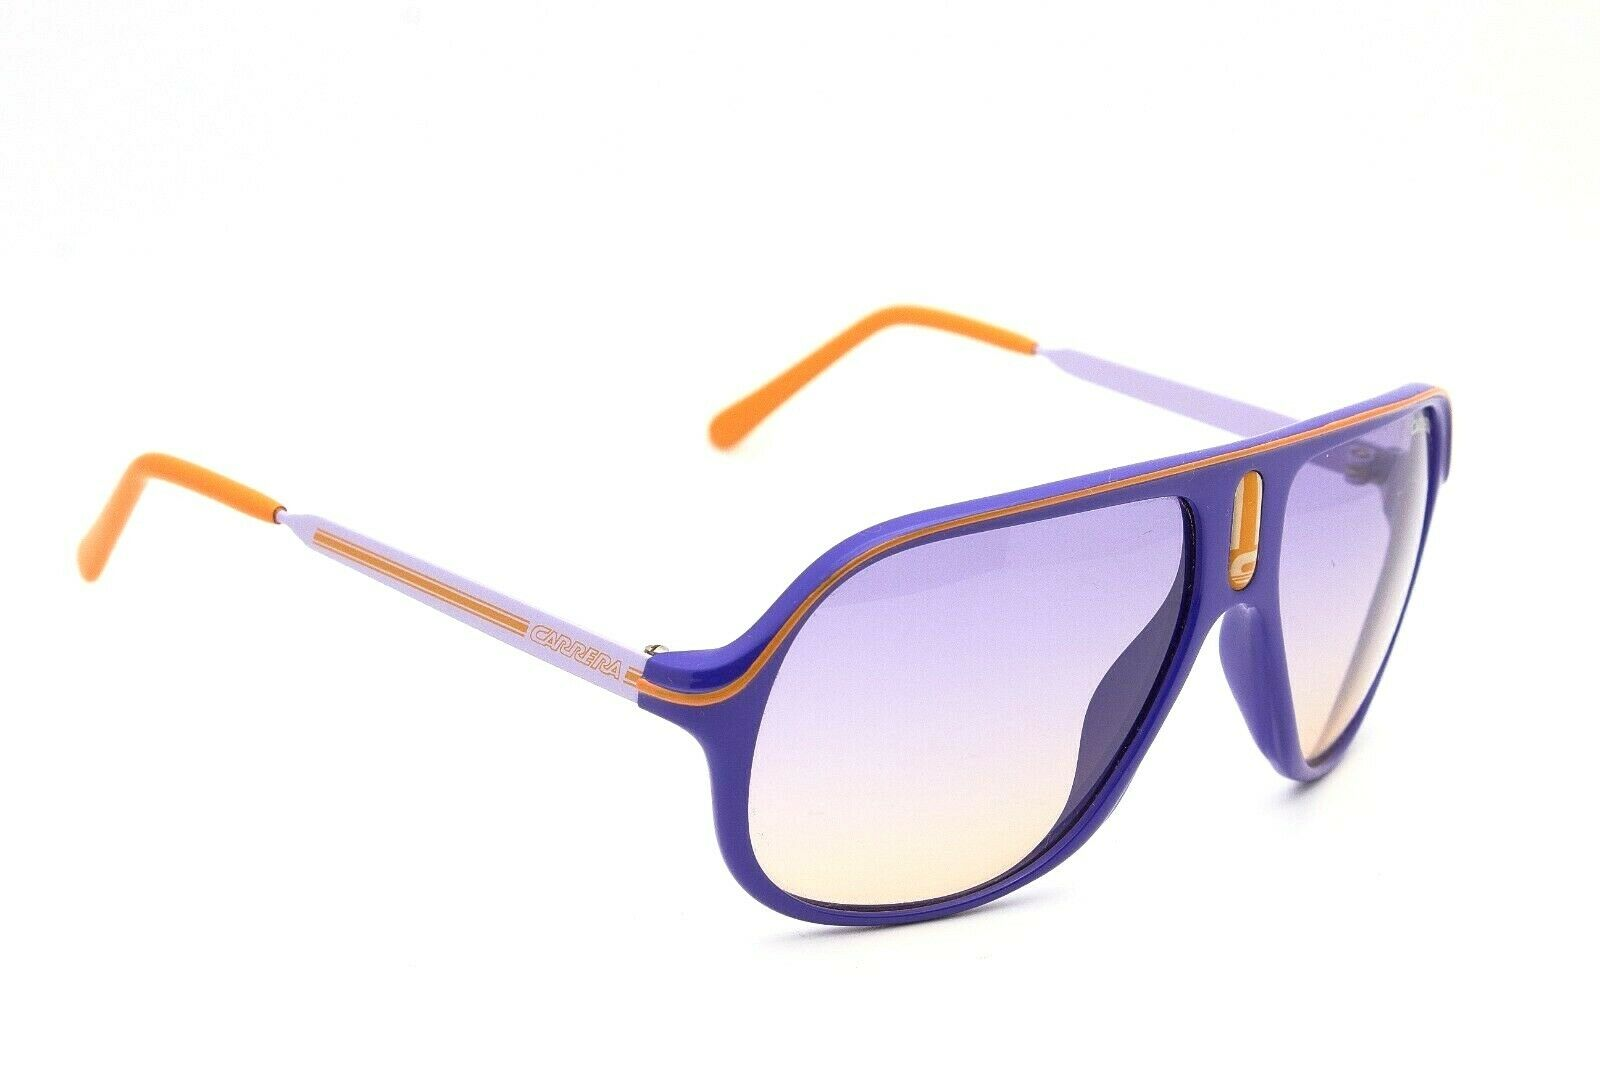 Carrera SAFARI A g2l Optyl Vintage Sunglasses Sunglasses Sport Fashion 90